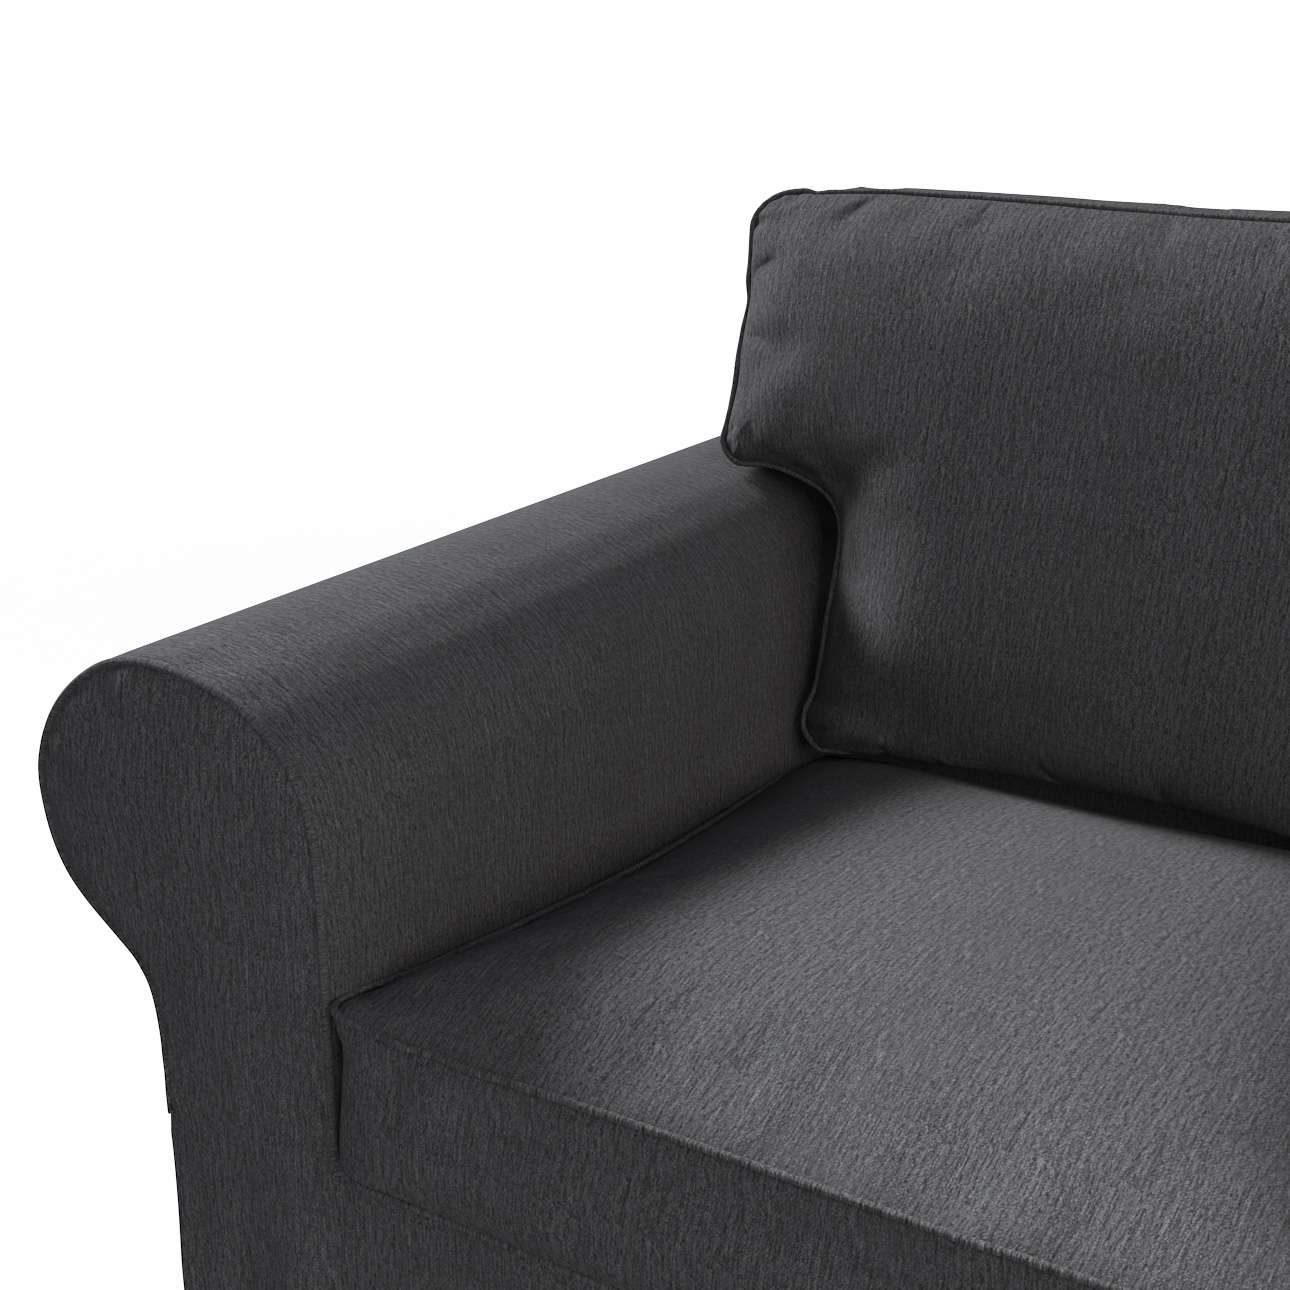 Ektorp 2 sæder sovesofa gammel model<br/>Bredde ca 195cm Betræk uden sofa fra kollektionen Chenille, Stof: 702-20